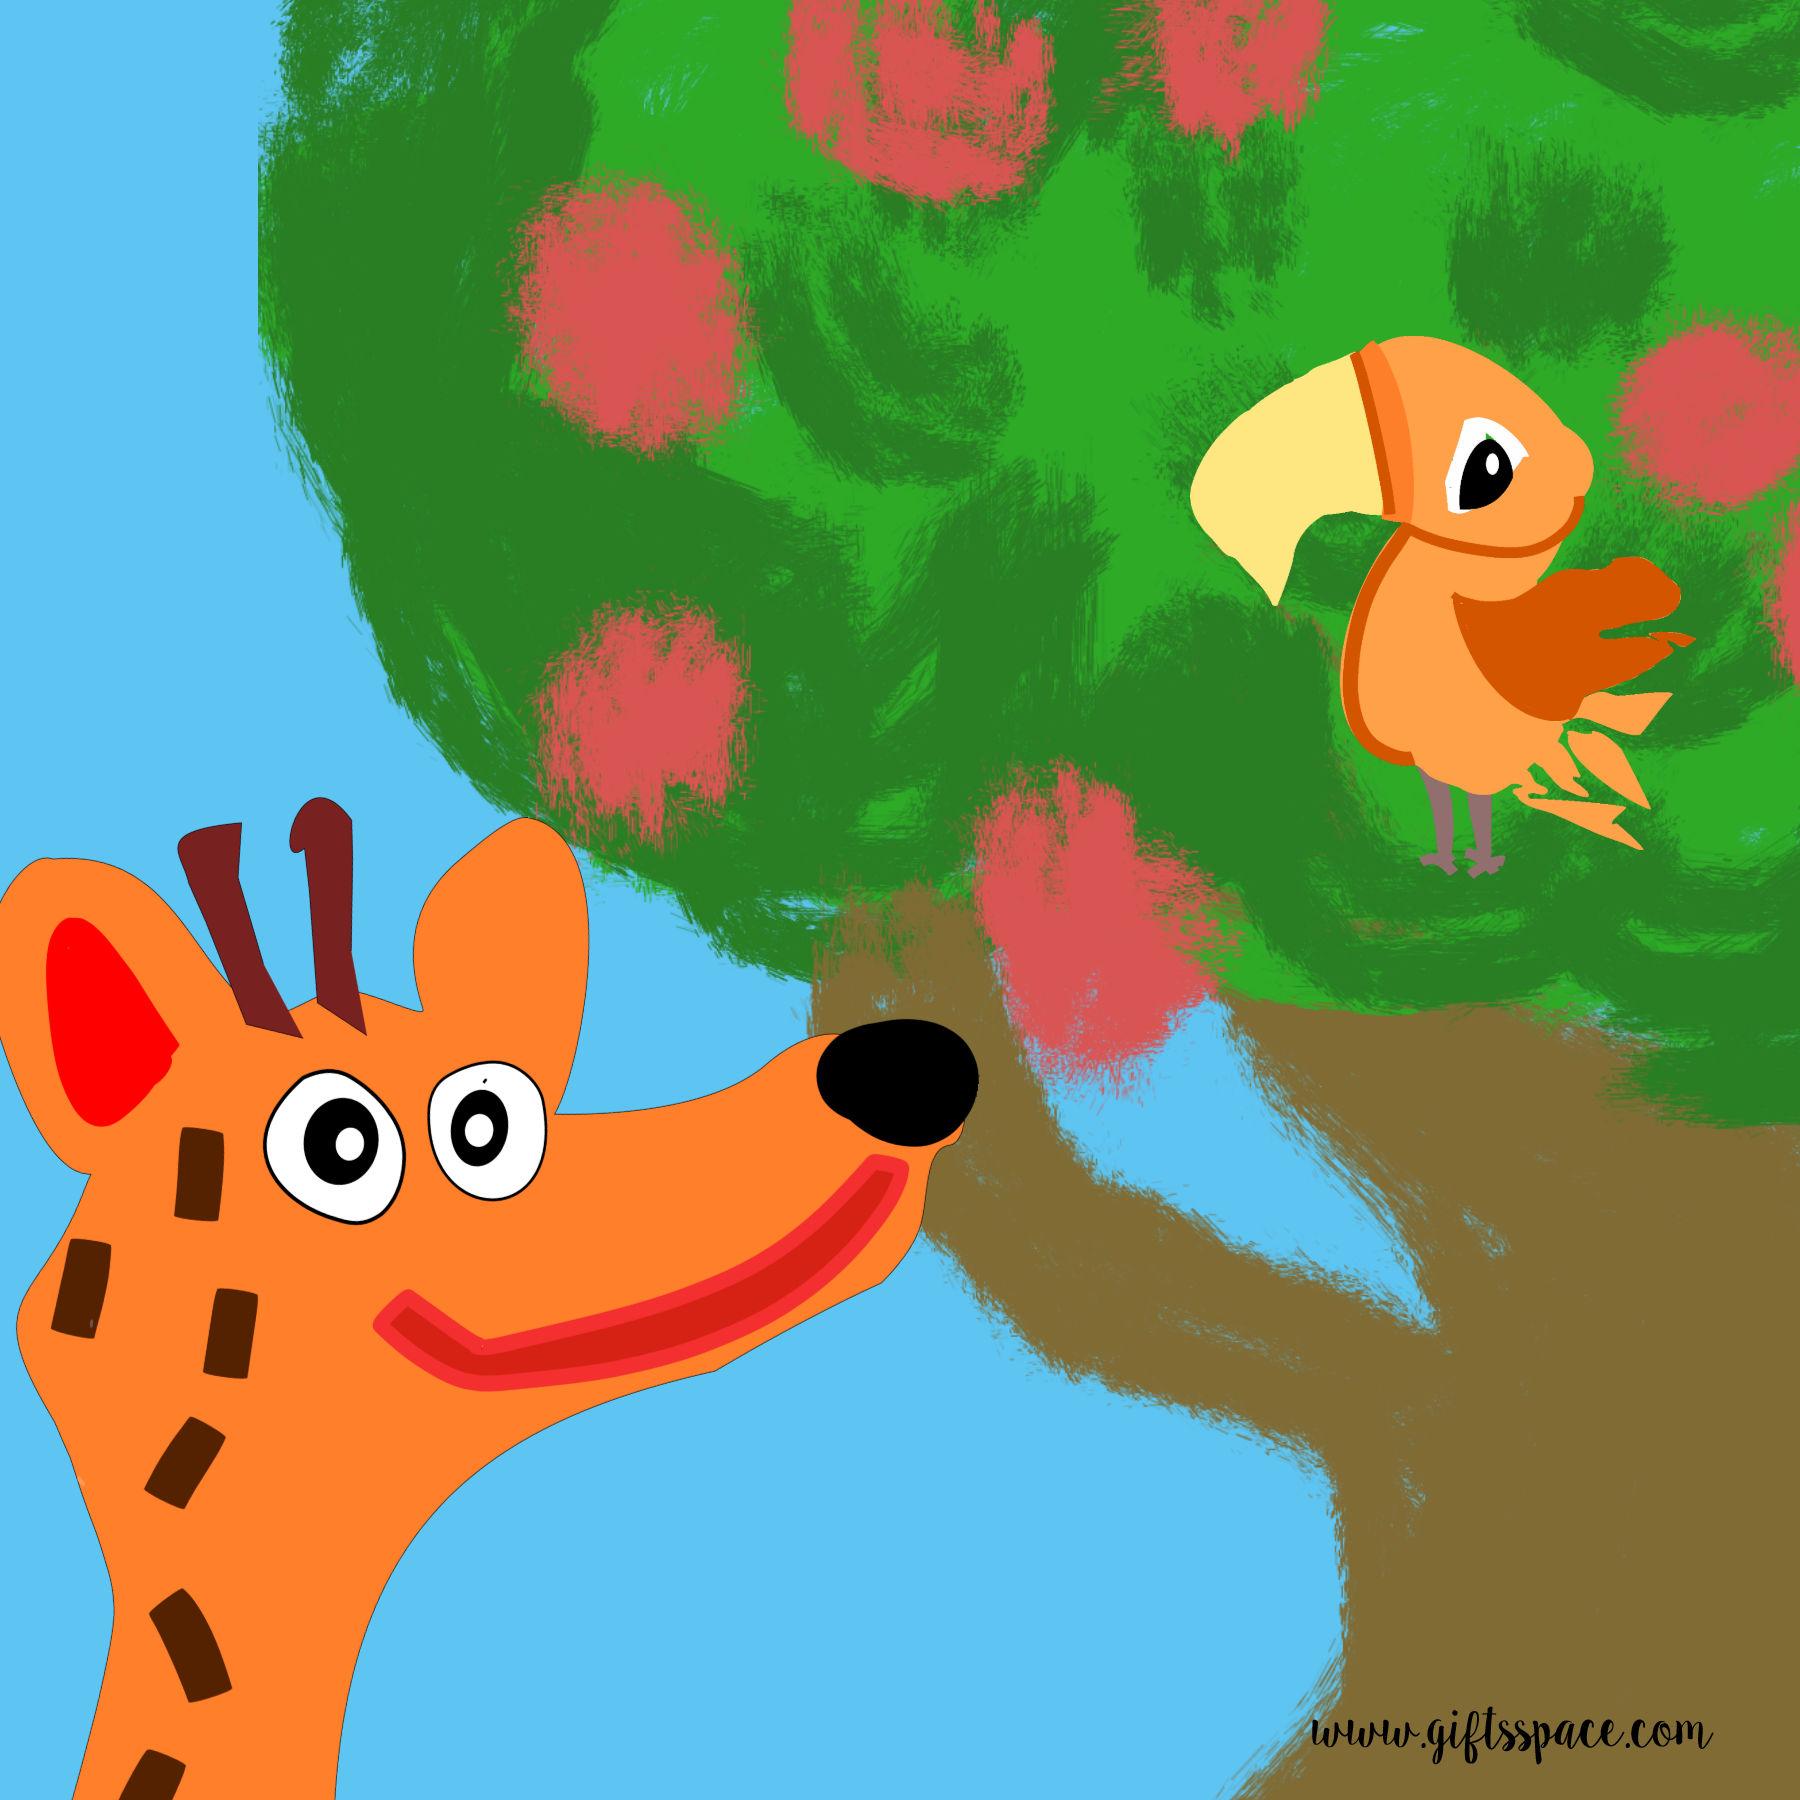 giraffe and the bird on a tree